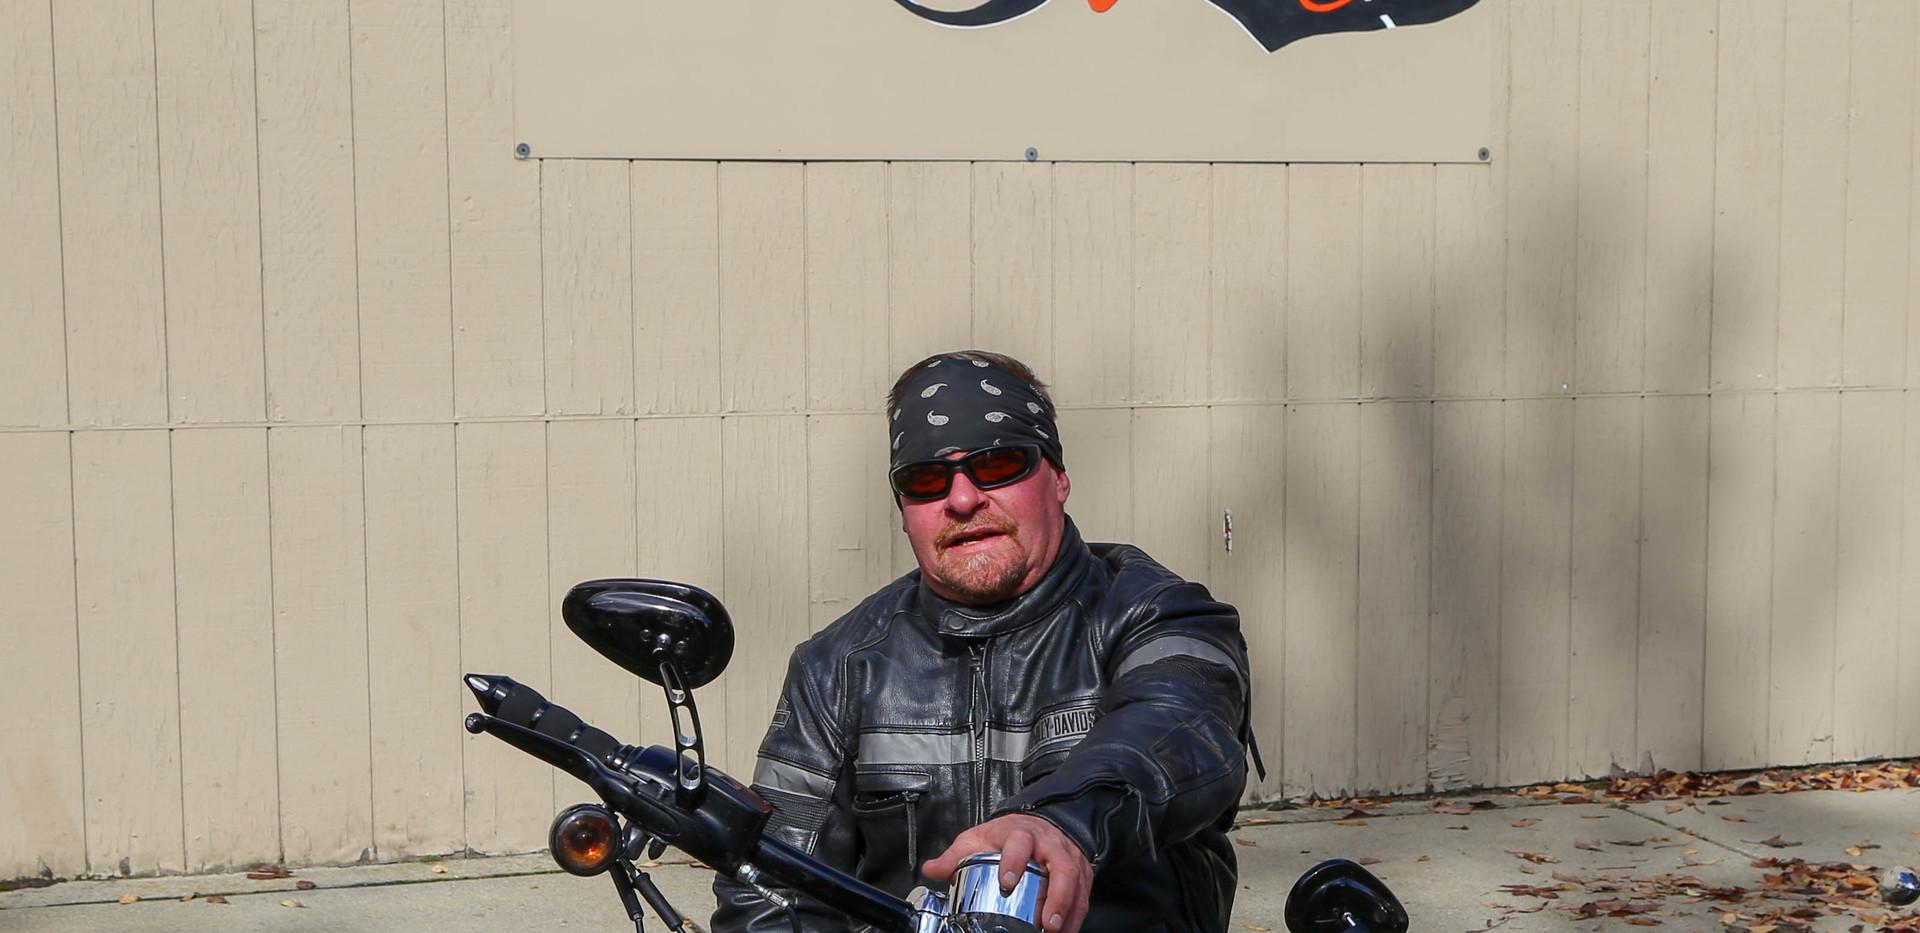 Biketoberfest2019-59.jpg